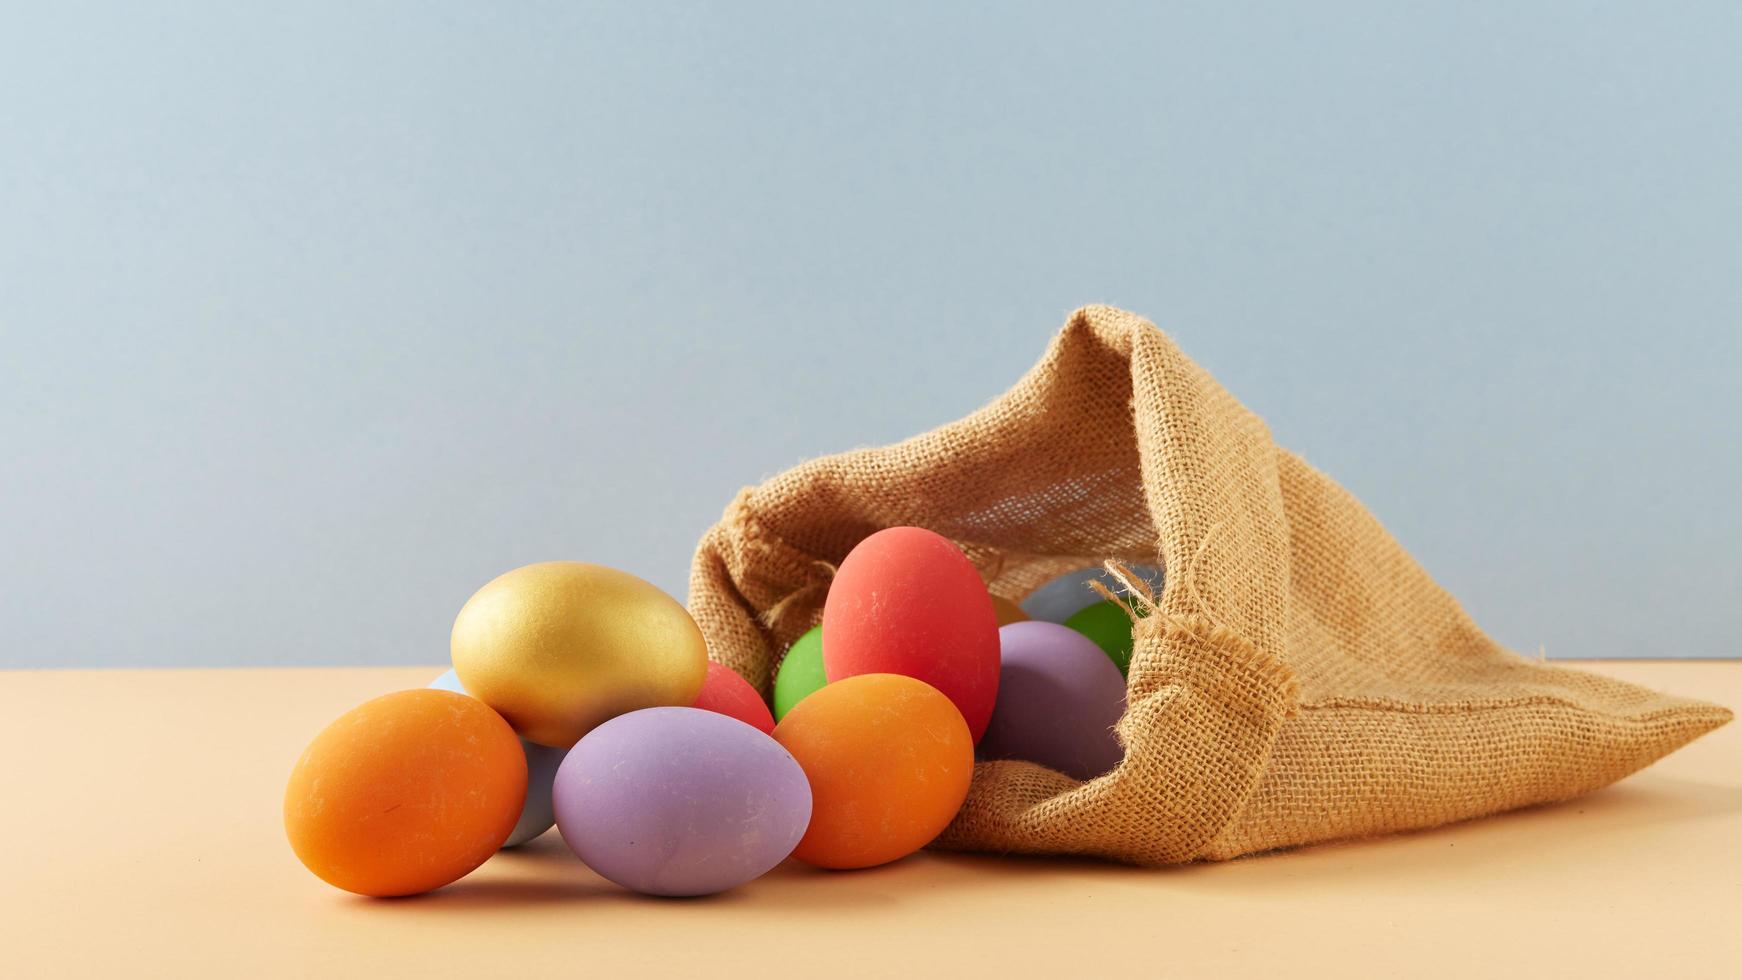 huevos de pascua en bolsa foto